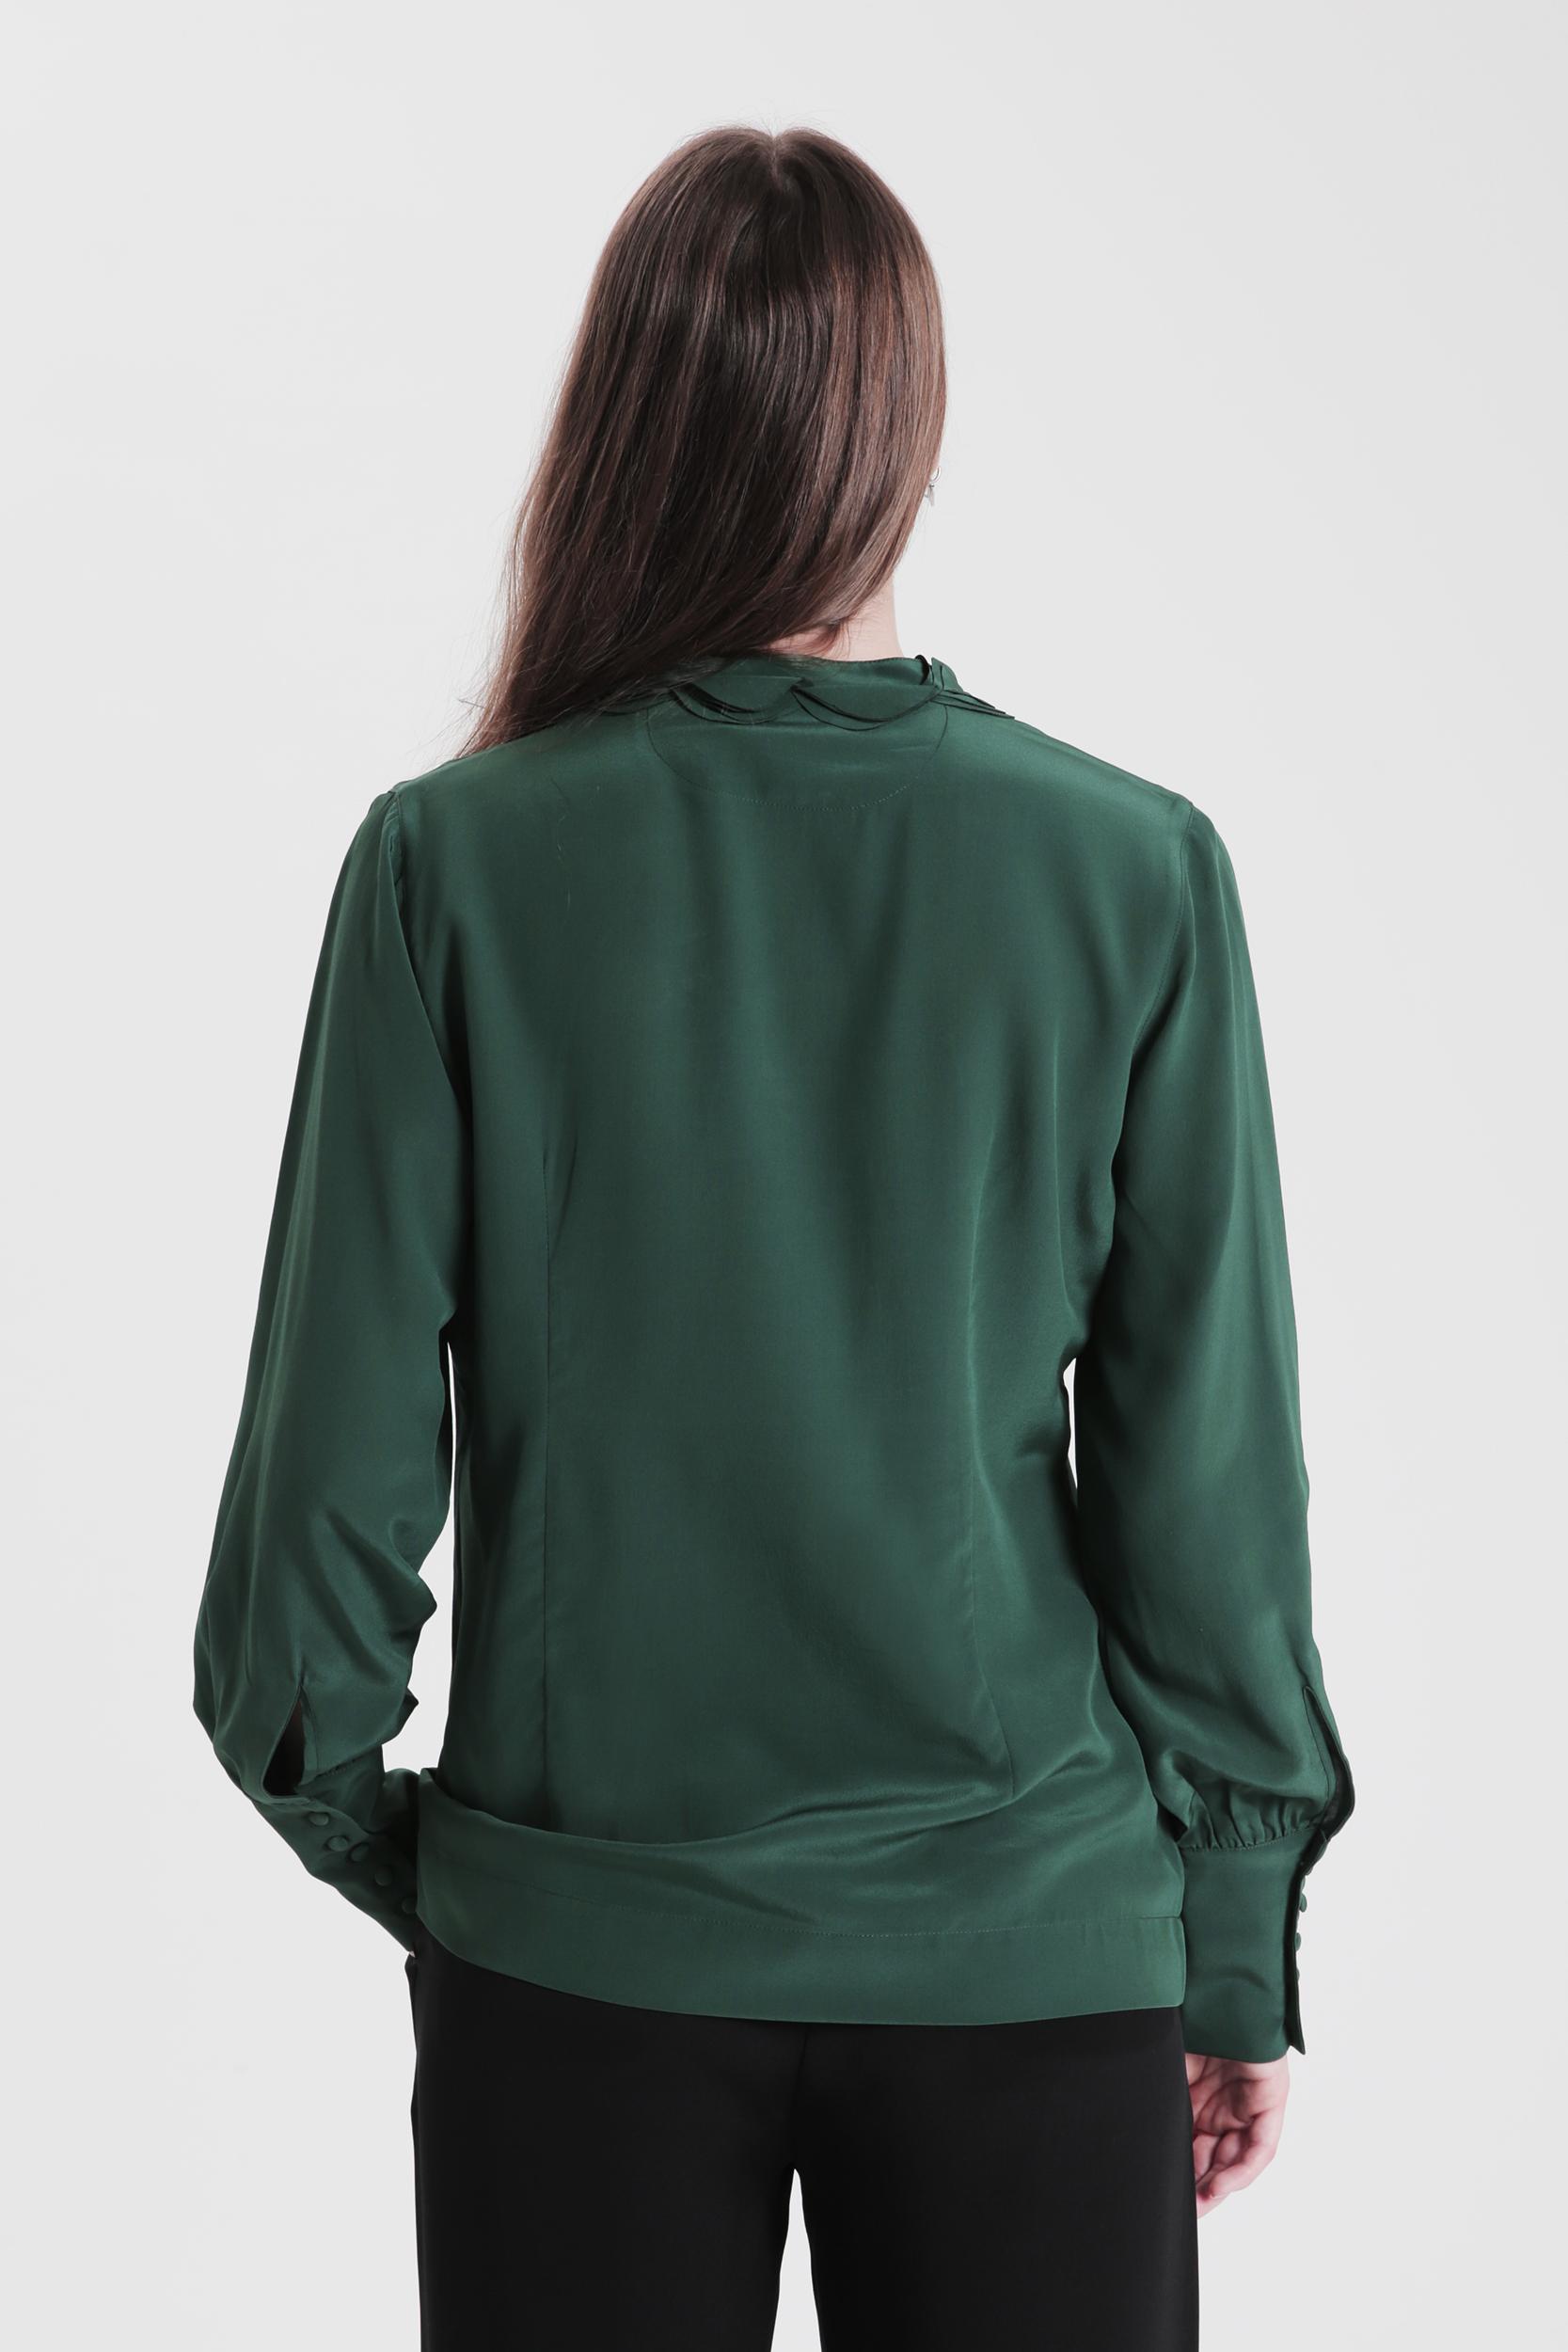 dark green SOFIE SILKEBLUSE  tirillm  Bluser - Dameklær er billig